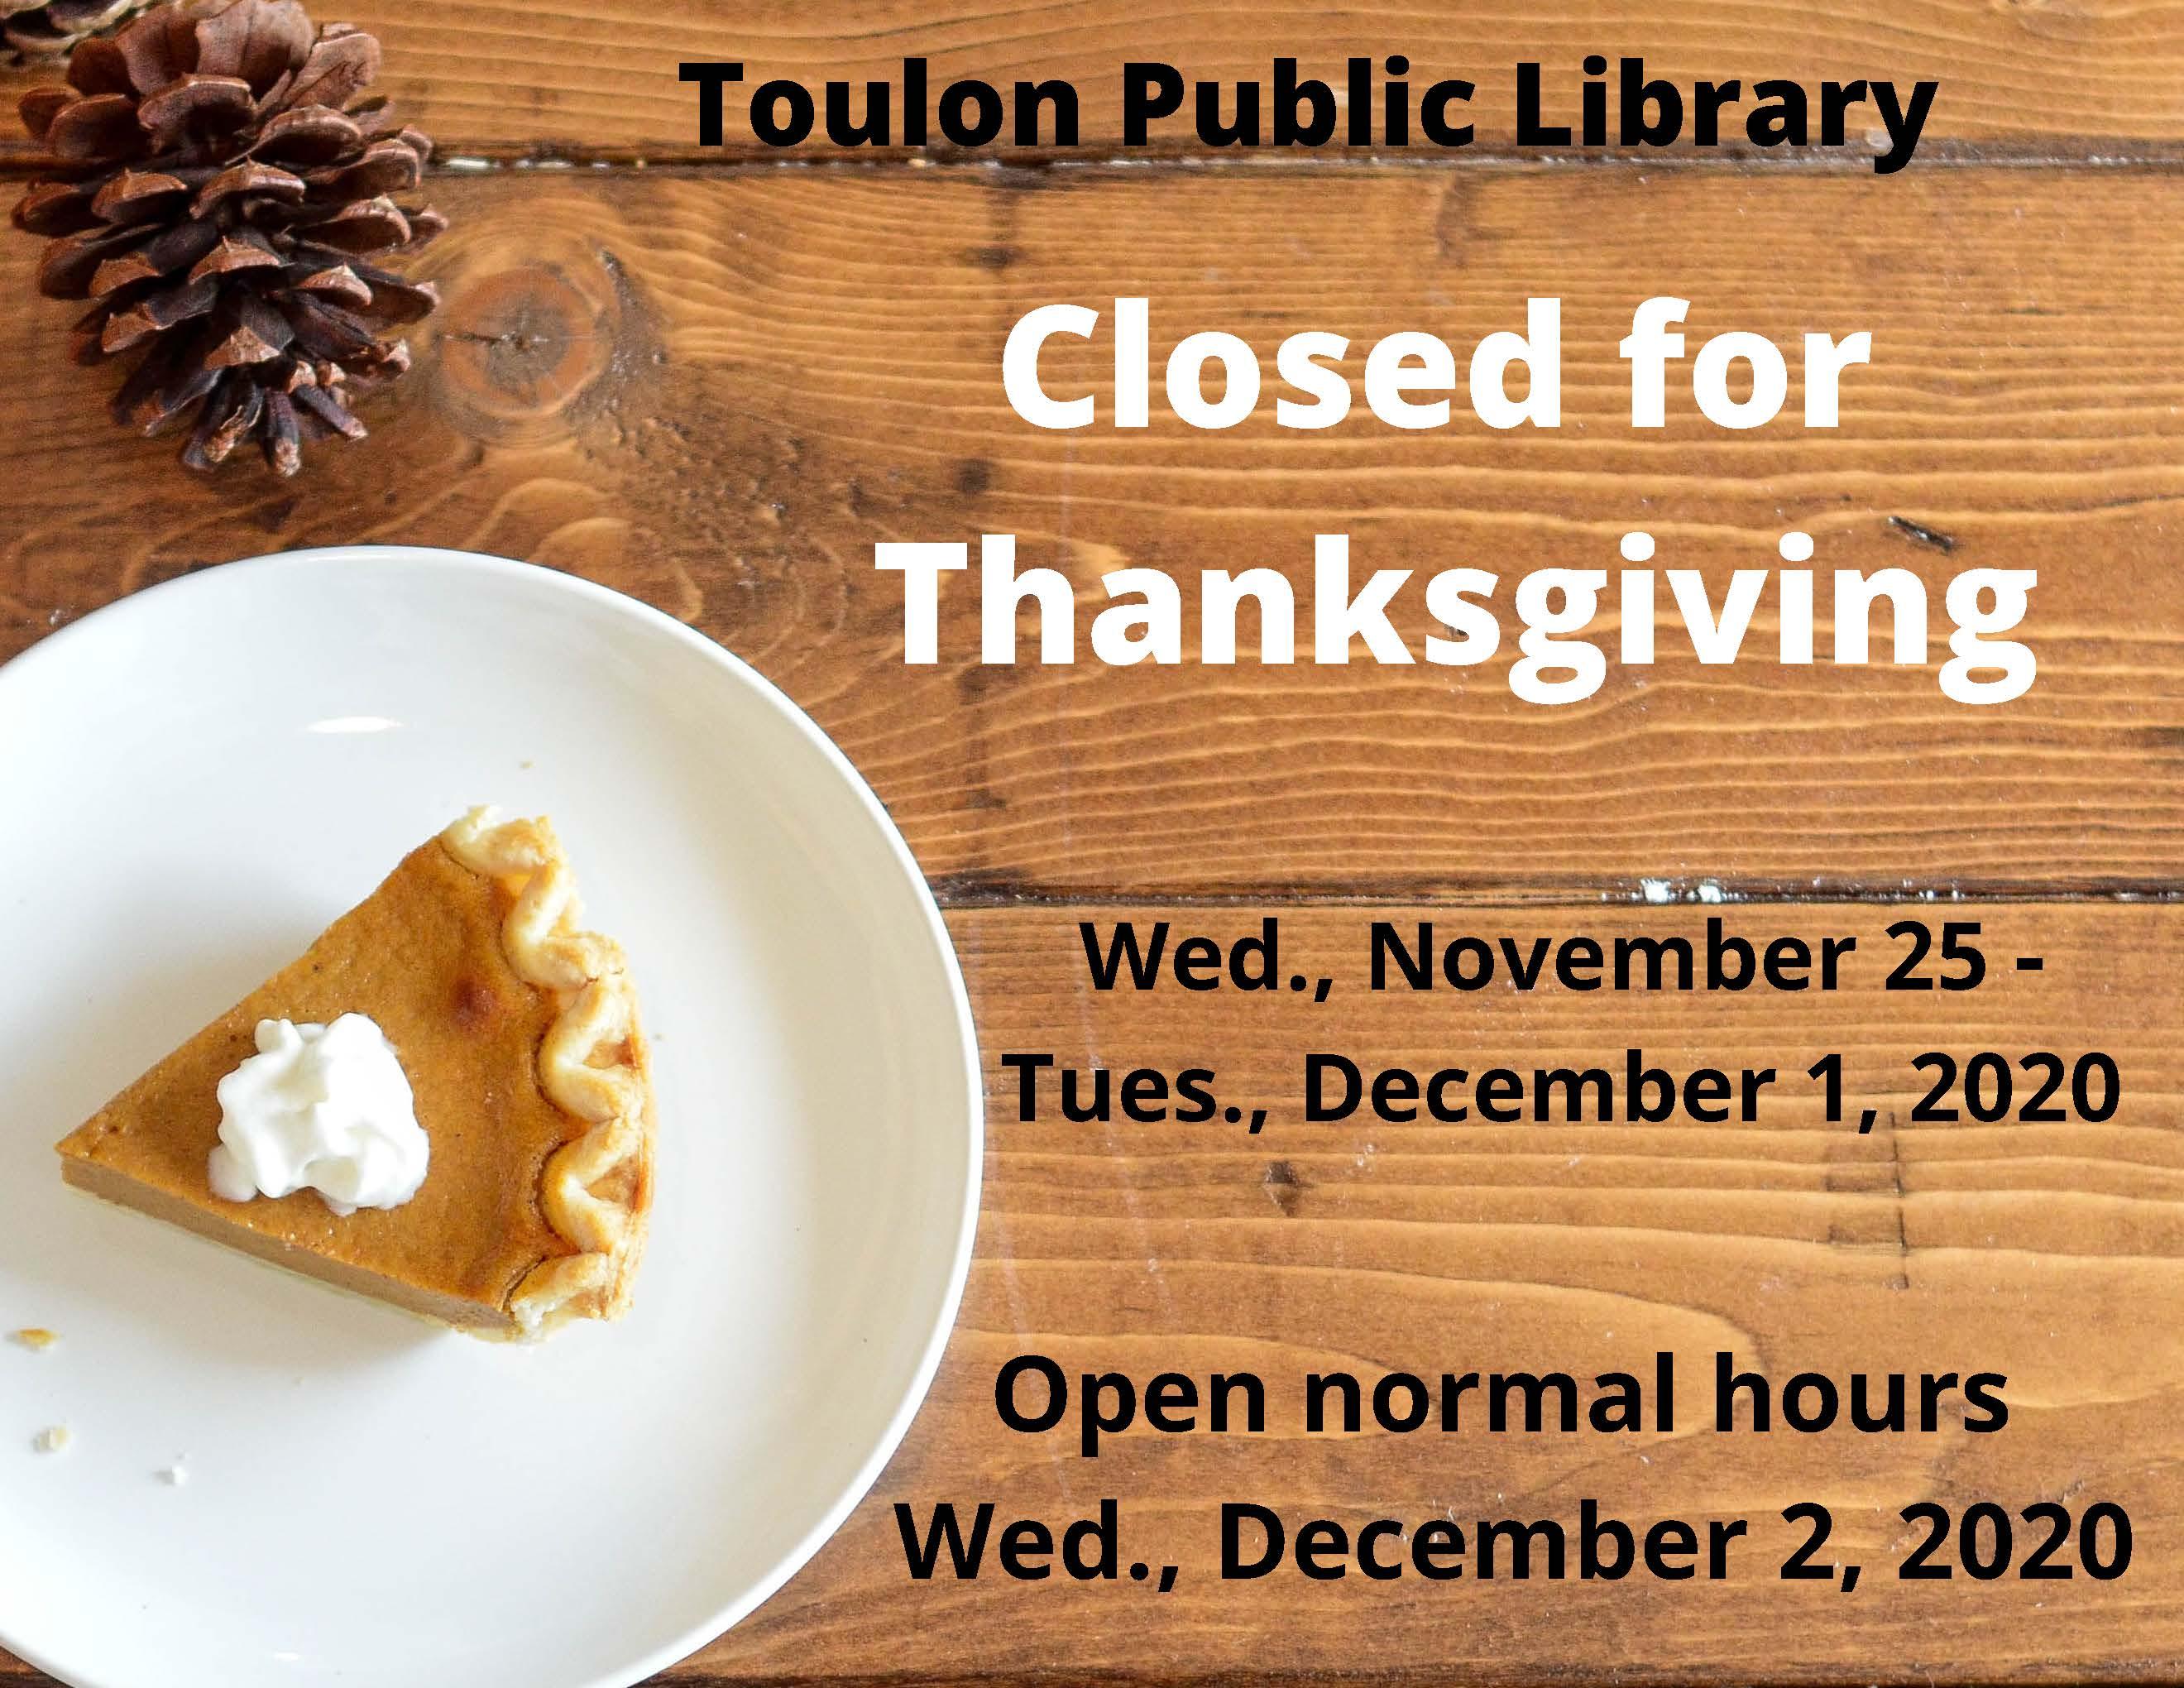 201125 Closed for Thanksgiving.jpg